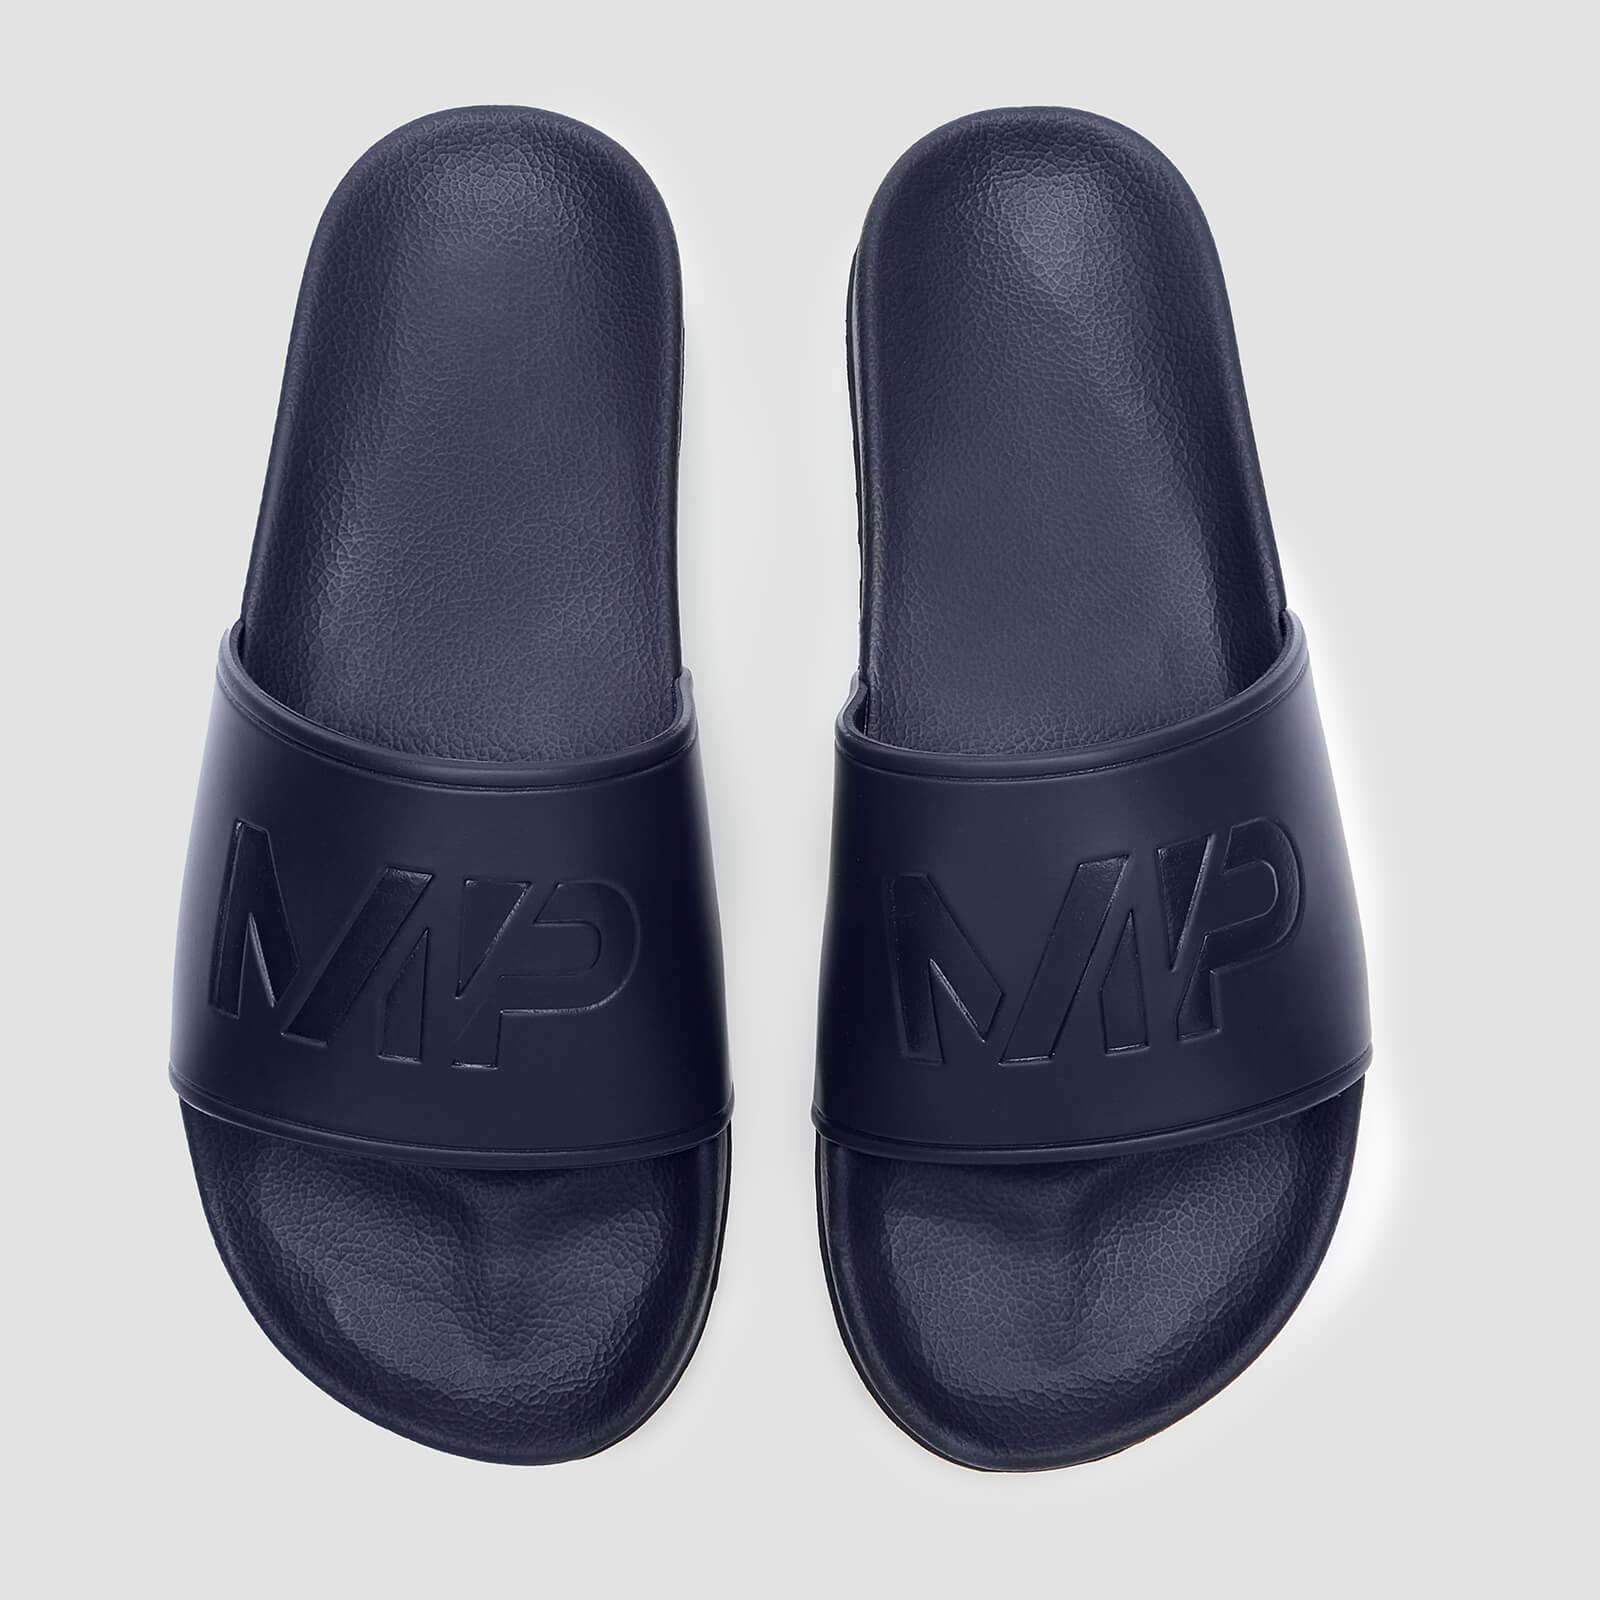 Купить MP Men's Sliders - Navy - UK 6, Myprotein International